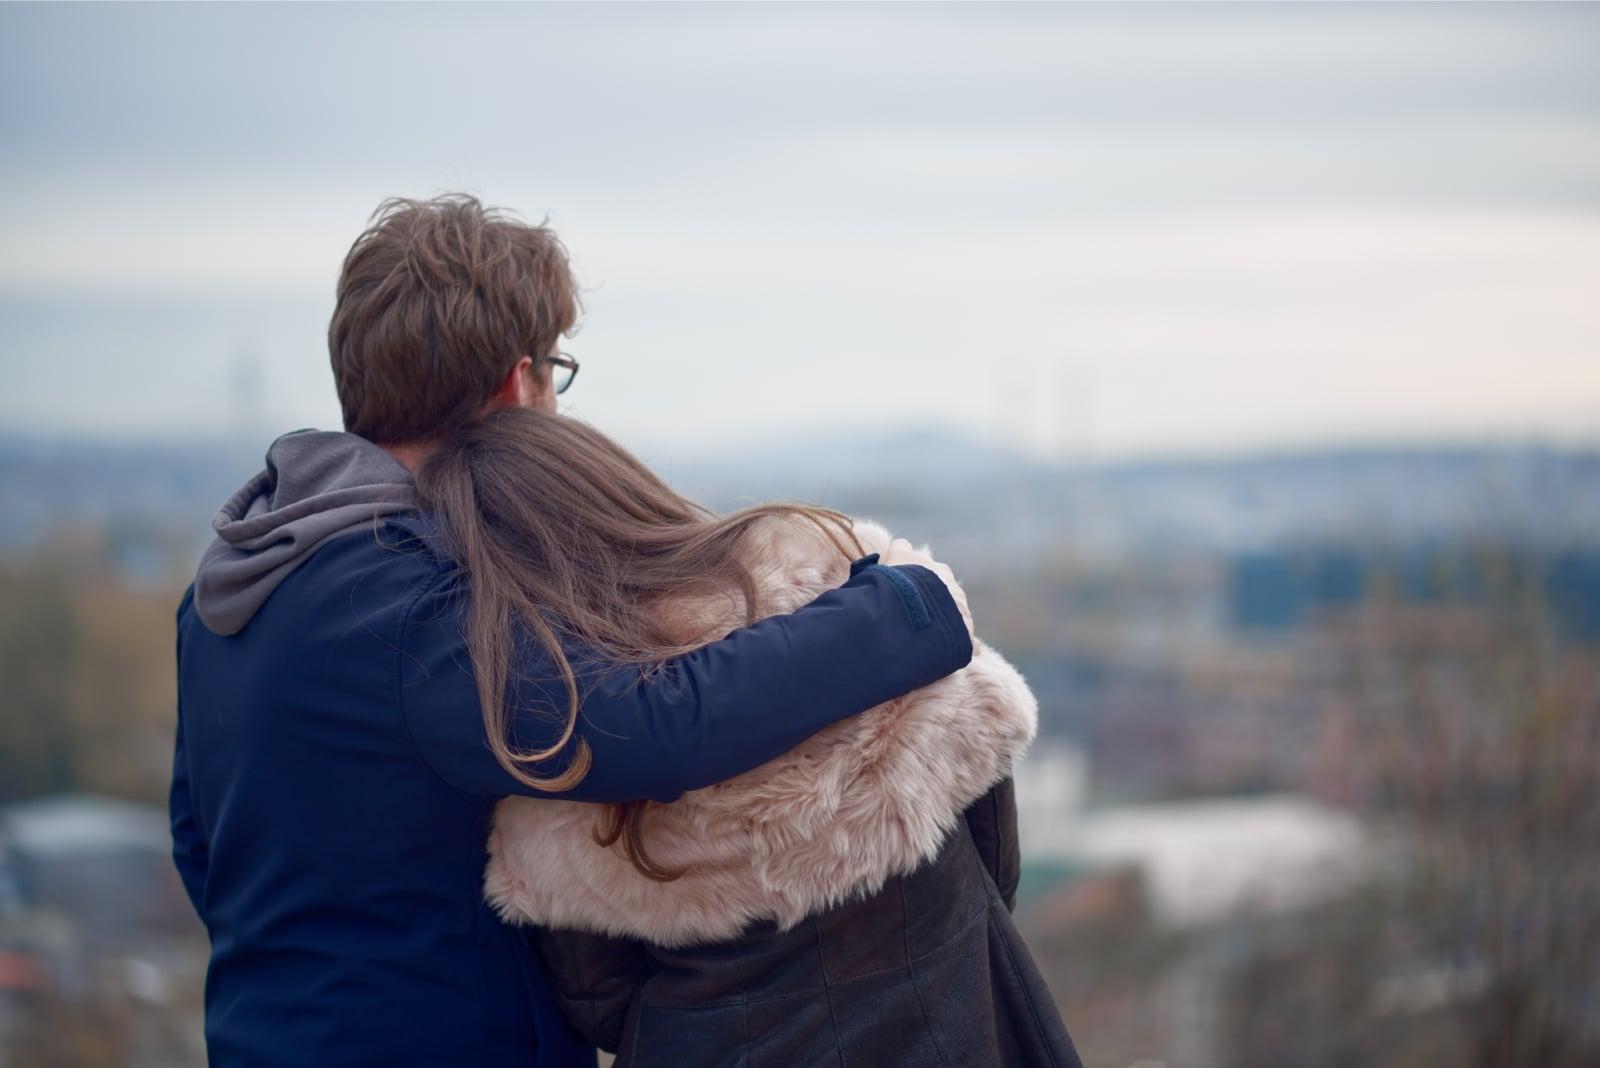 man in black jacket hugging woman outdoor